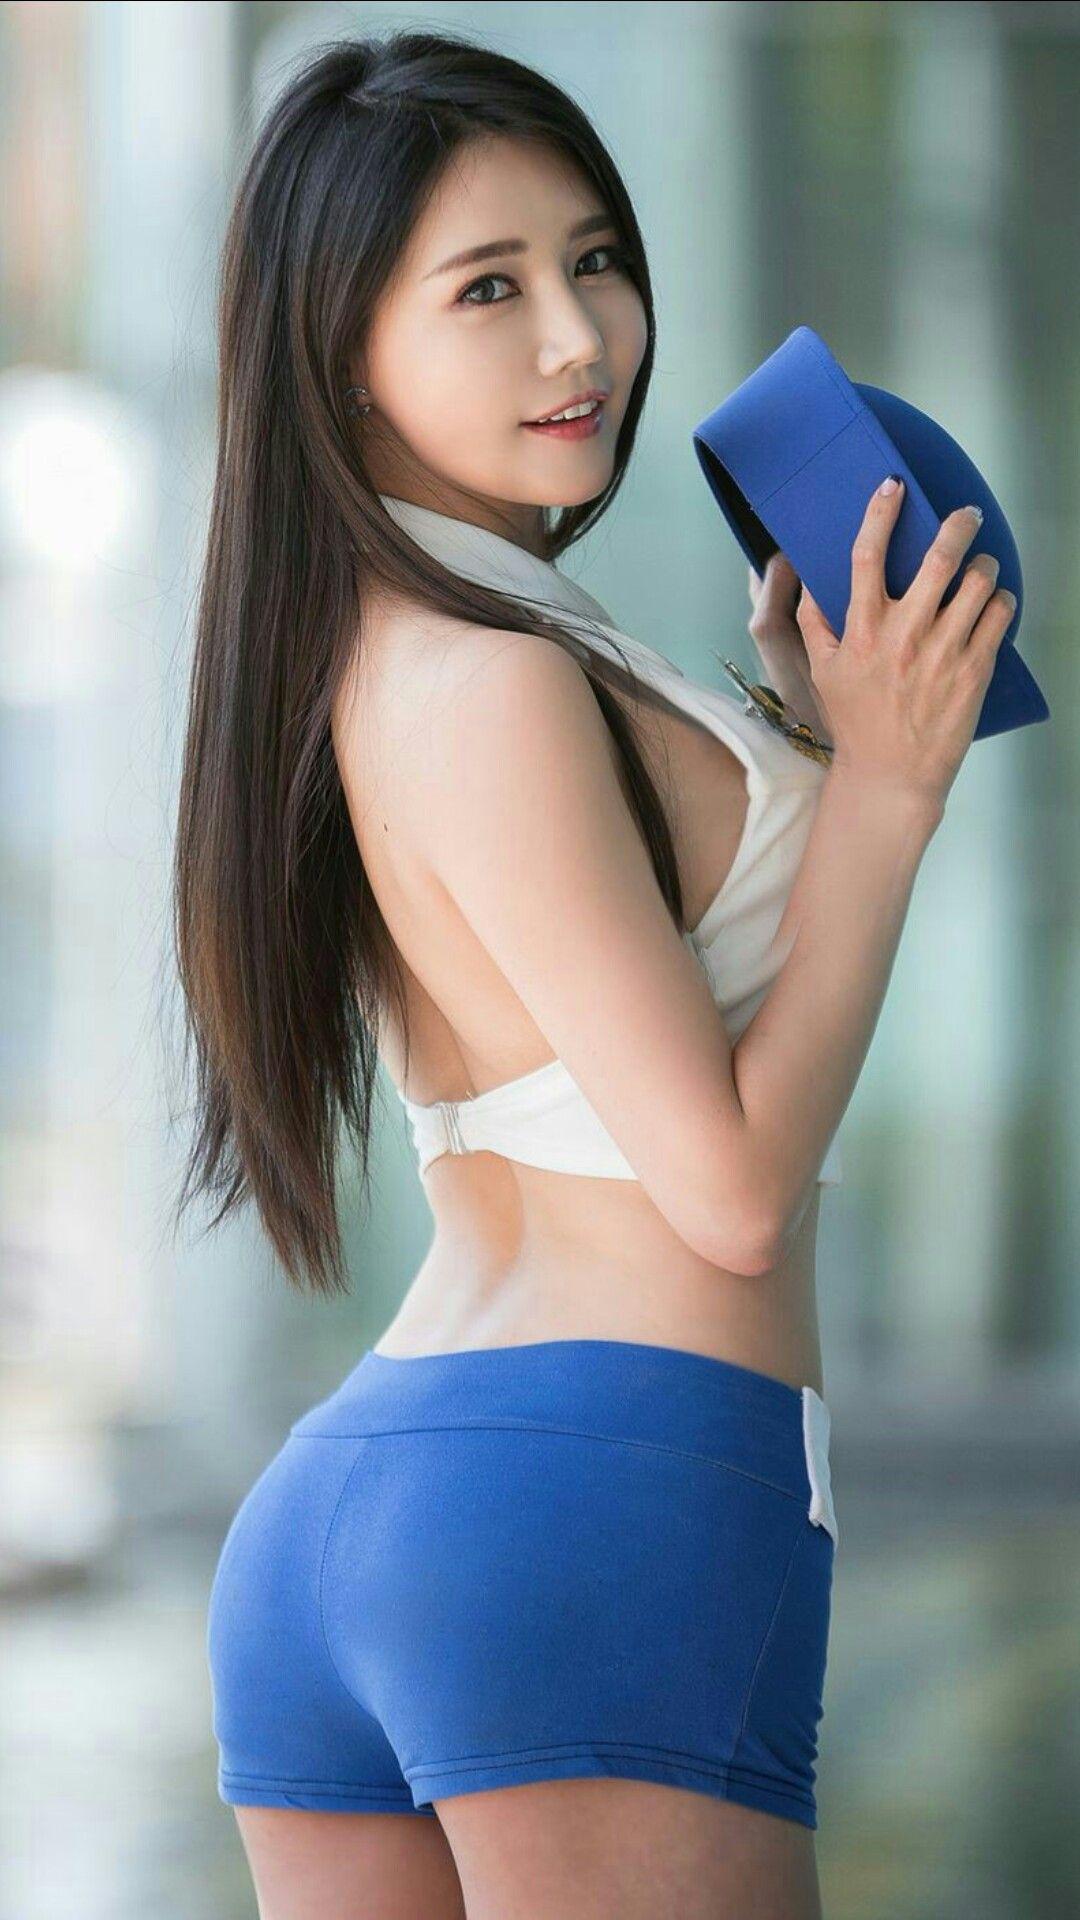 Hot Asian Girl Gangbang